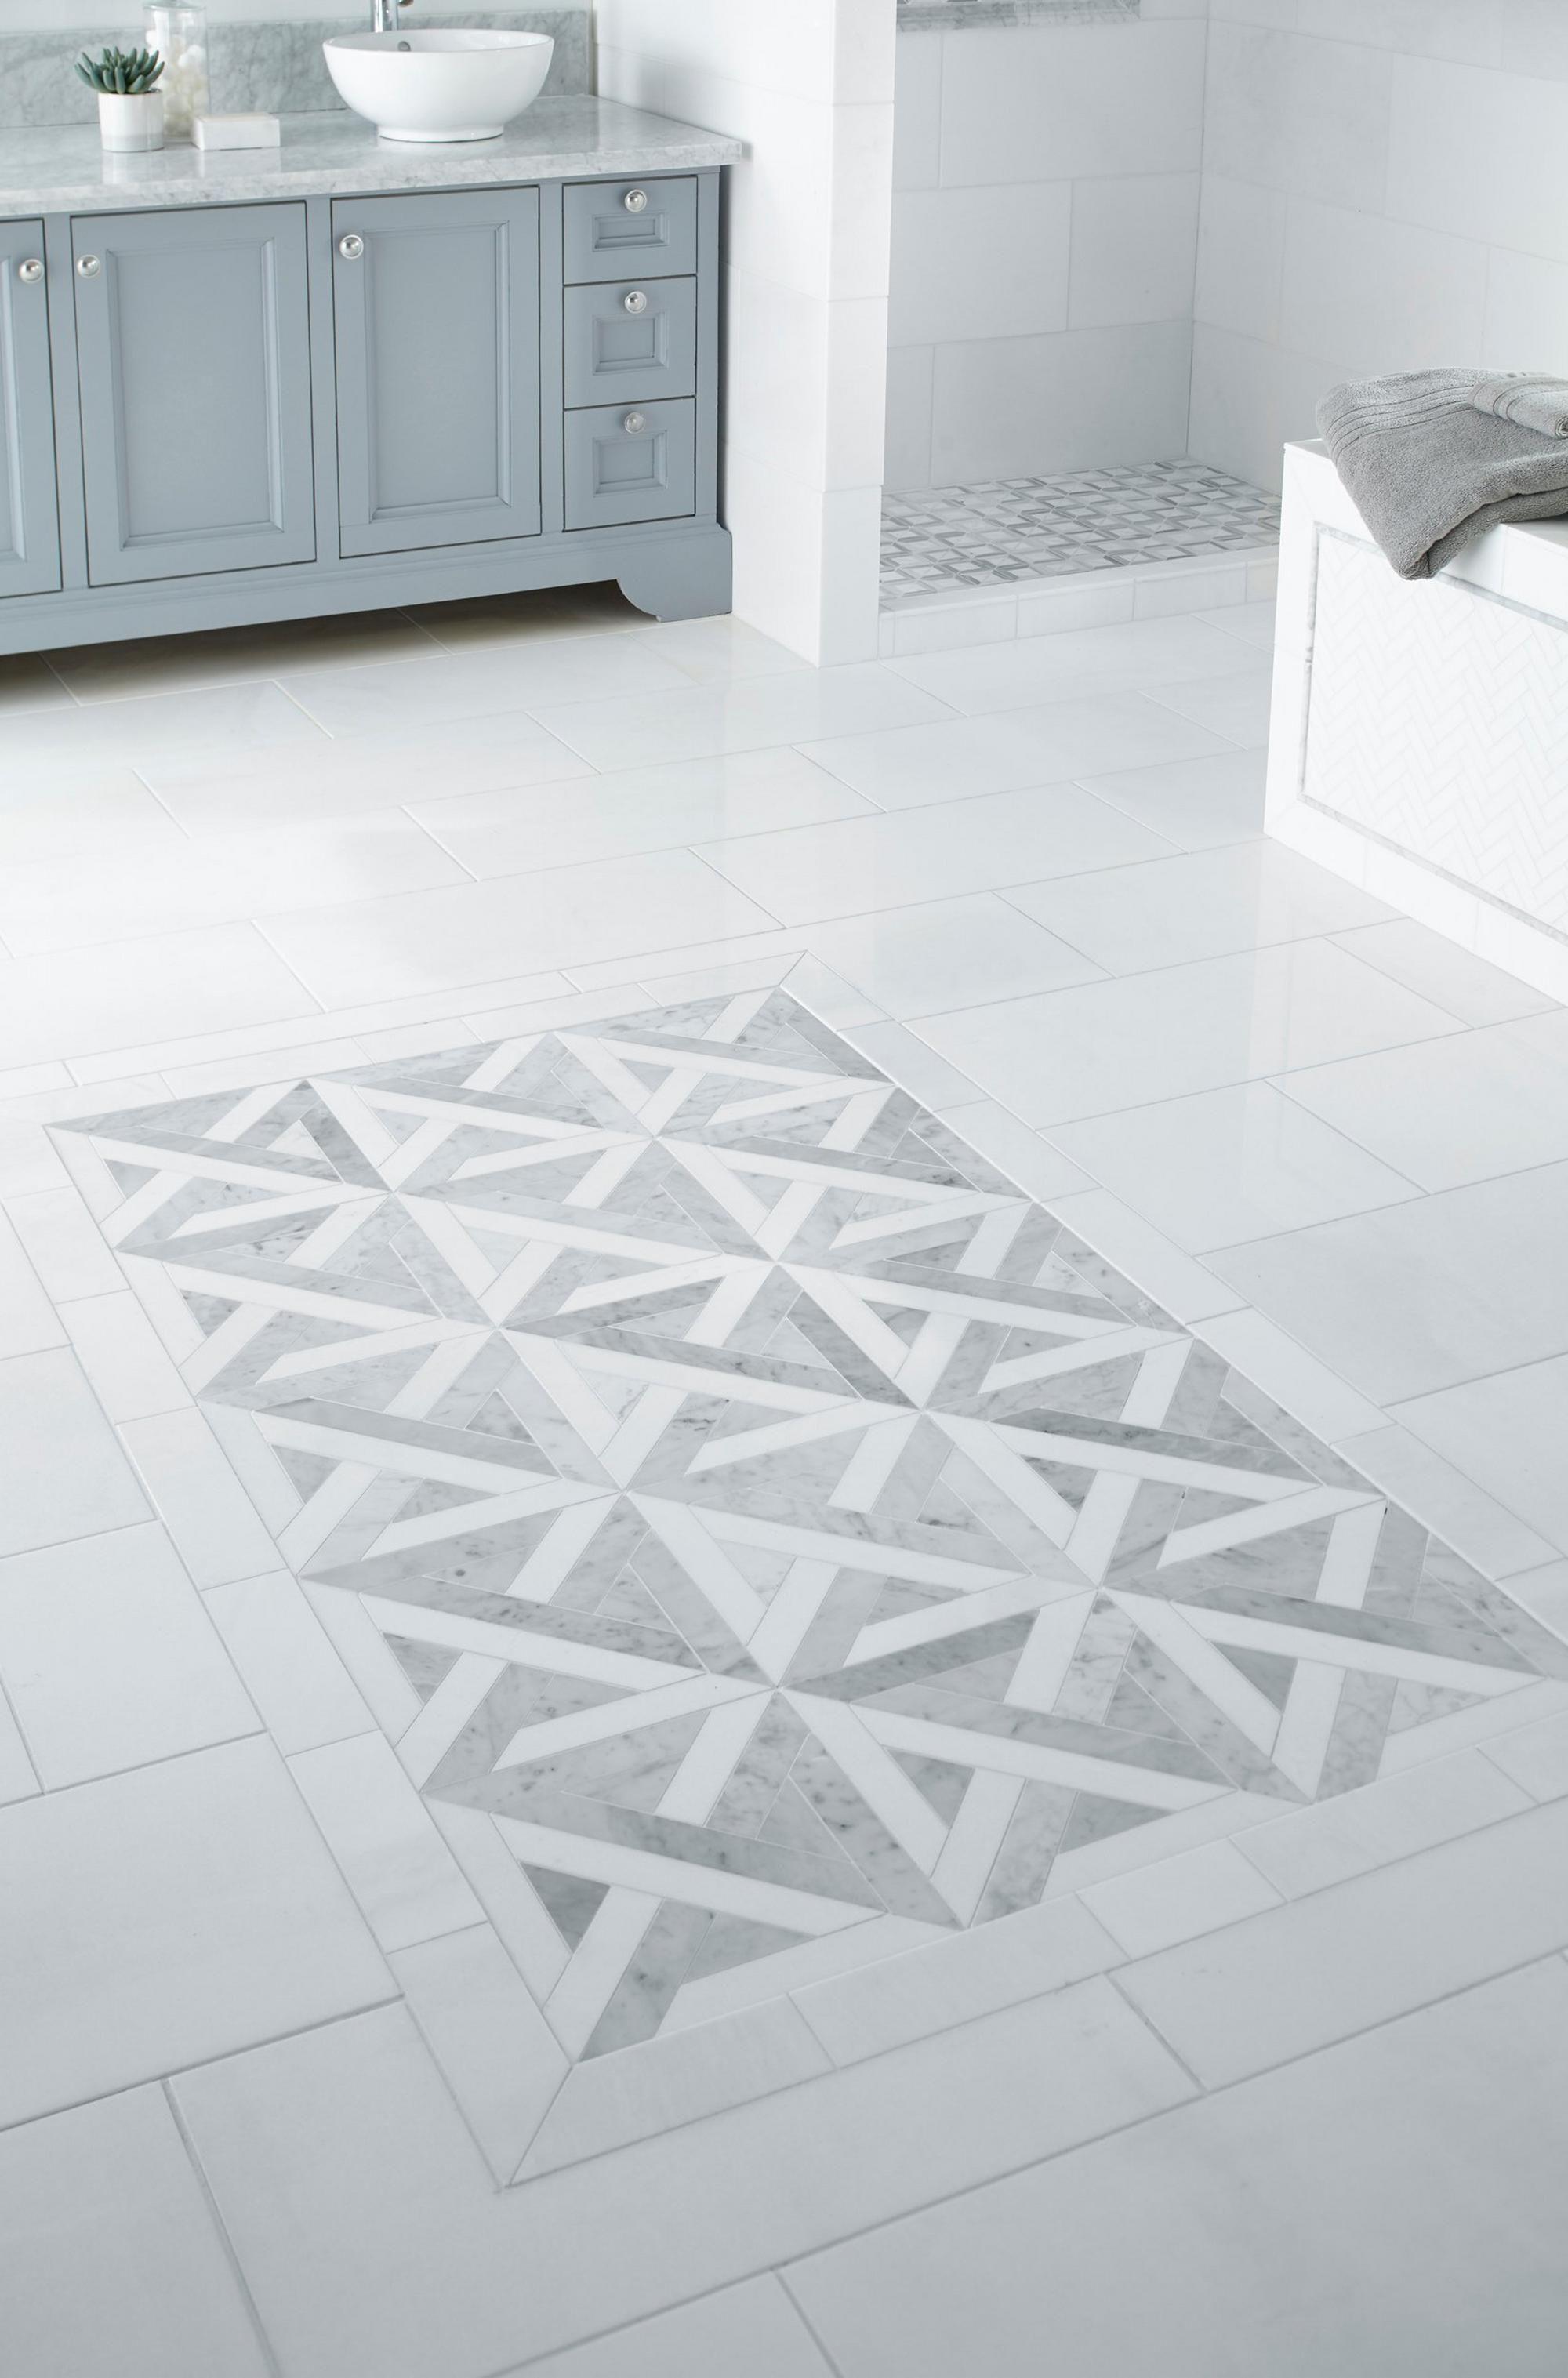 Bianco Carrara Thassos Parquet Marble Mosaic Foyer Tile Ideas Brick Wall Decor Flooring